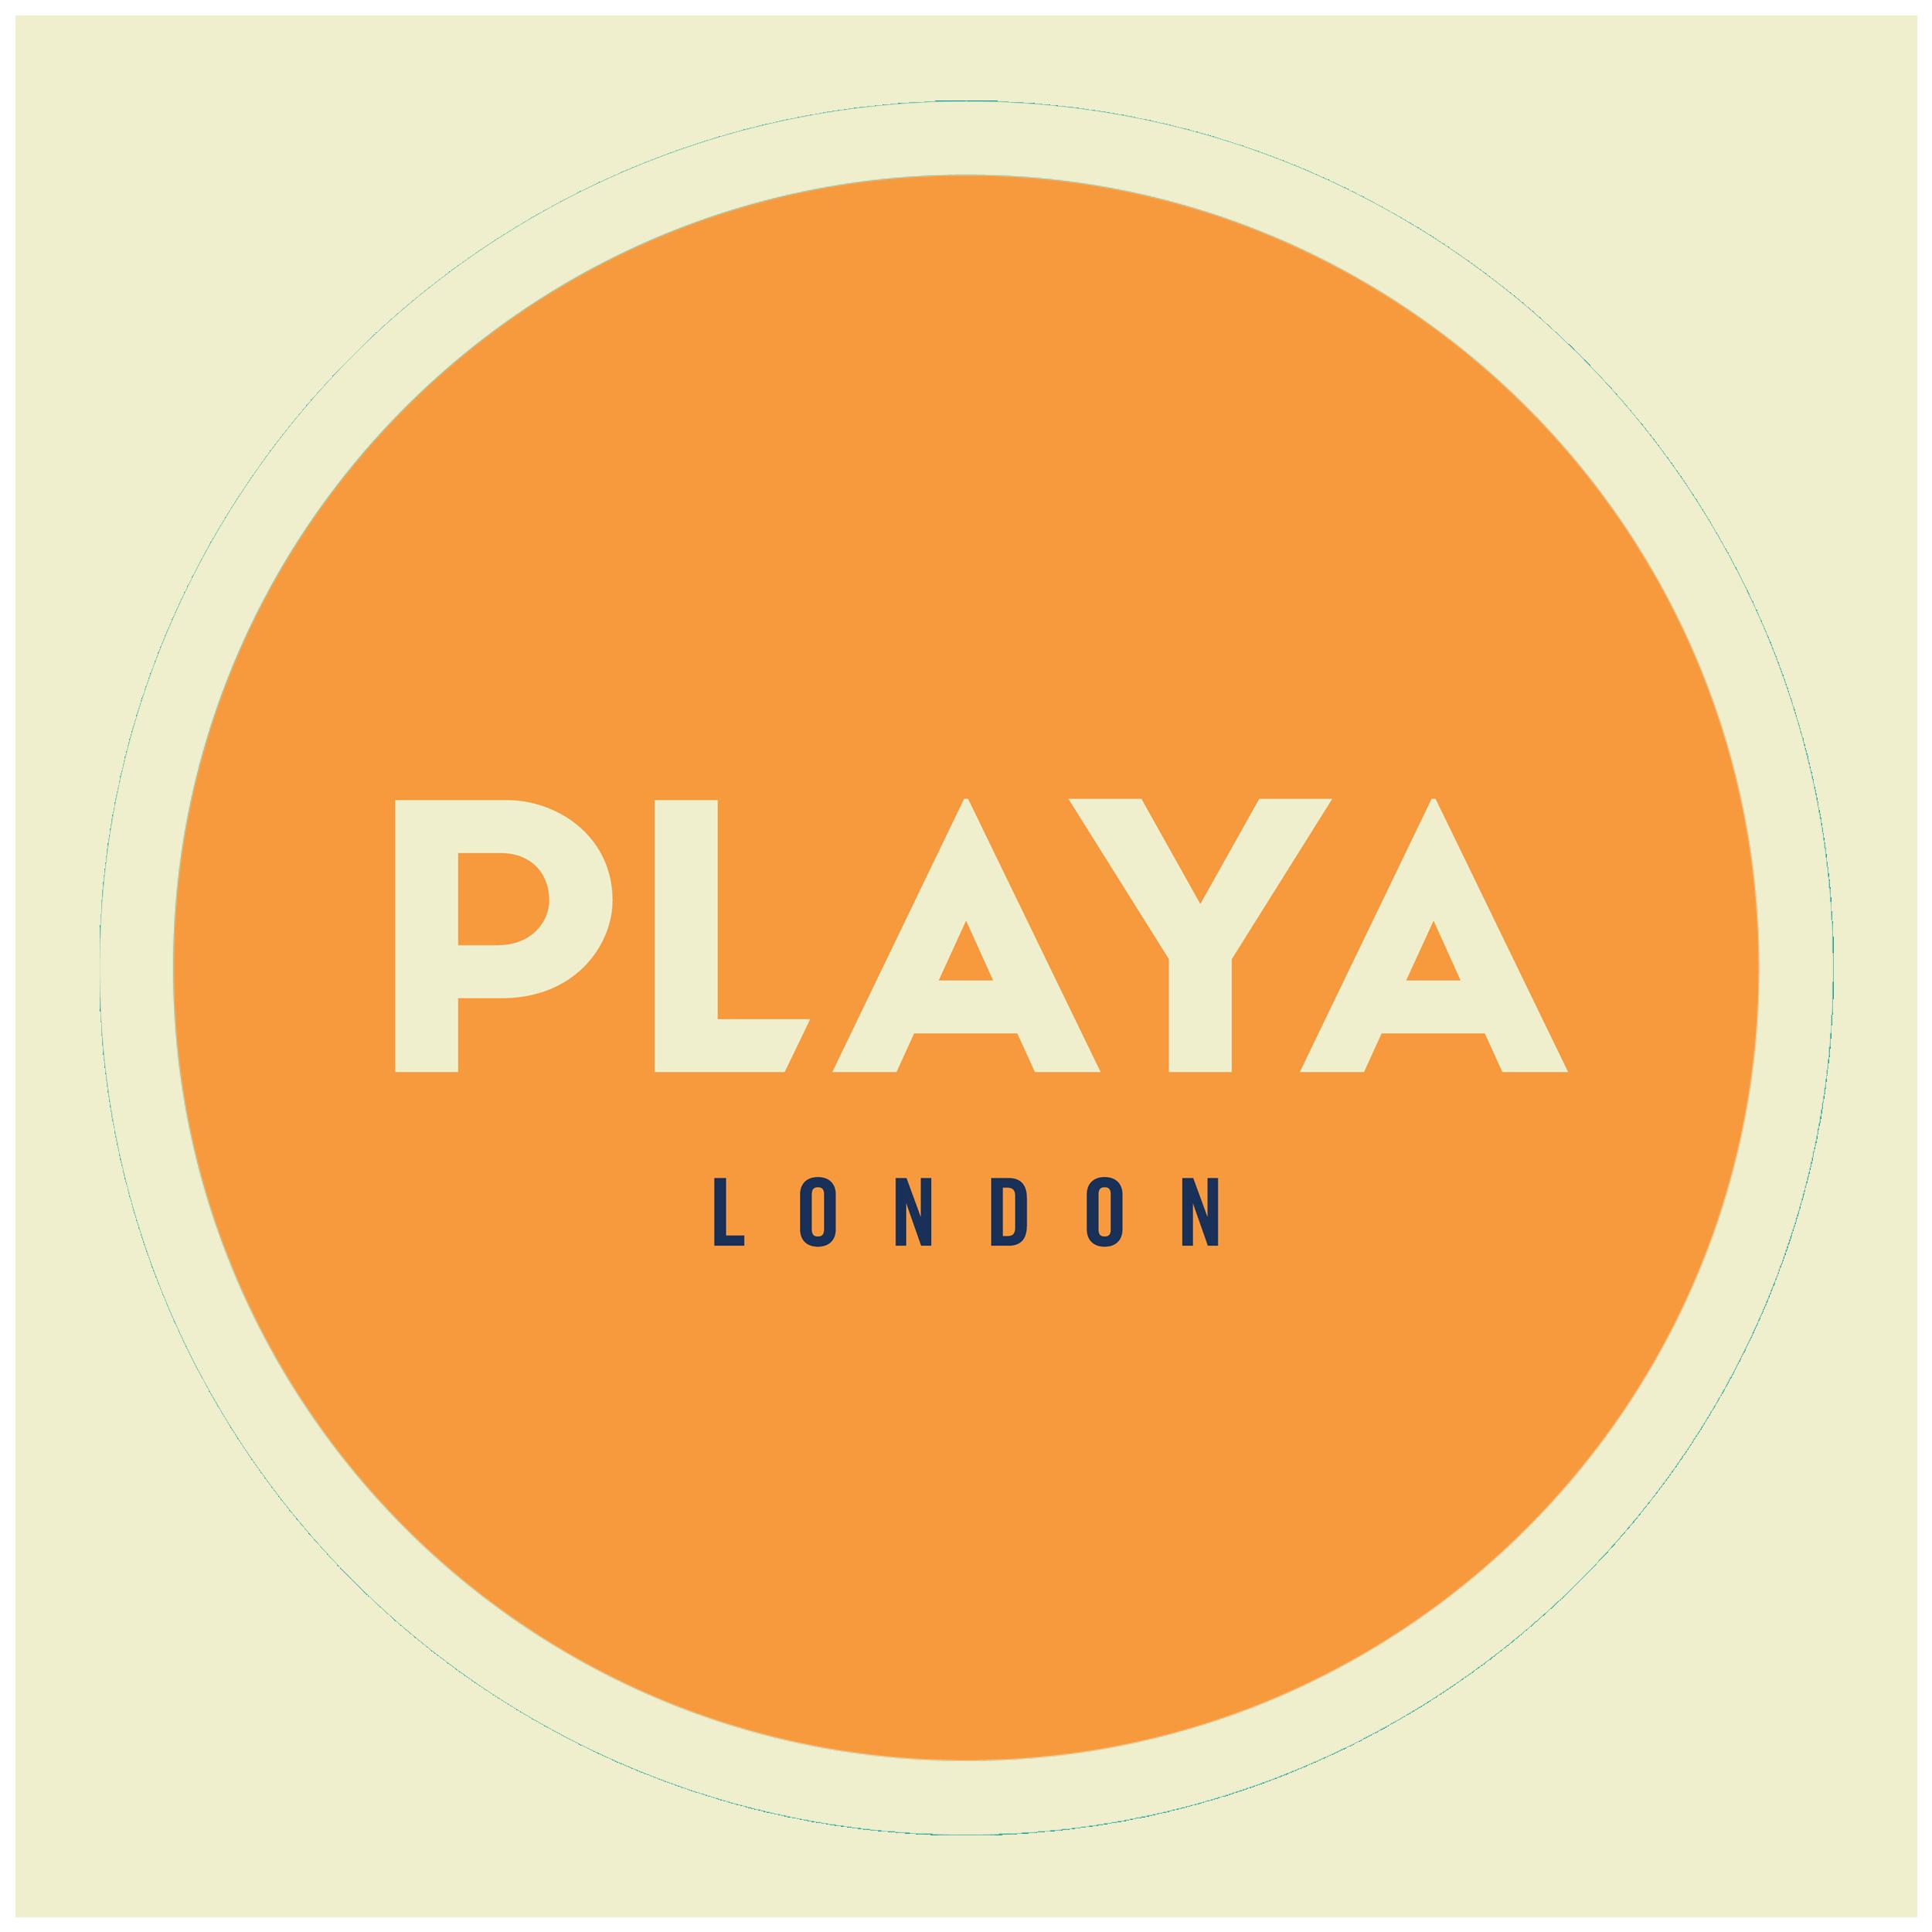 Playa London